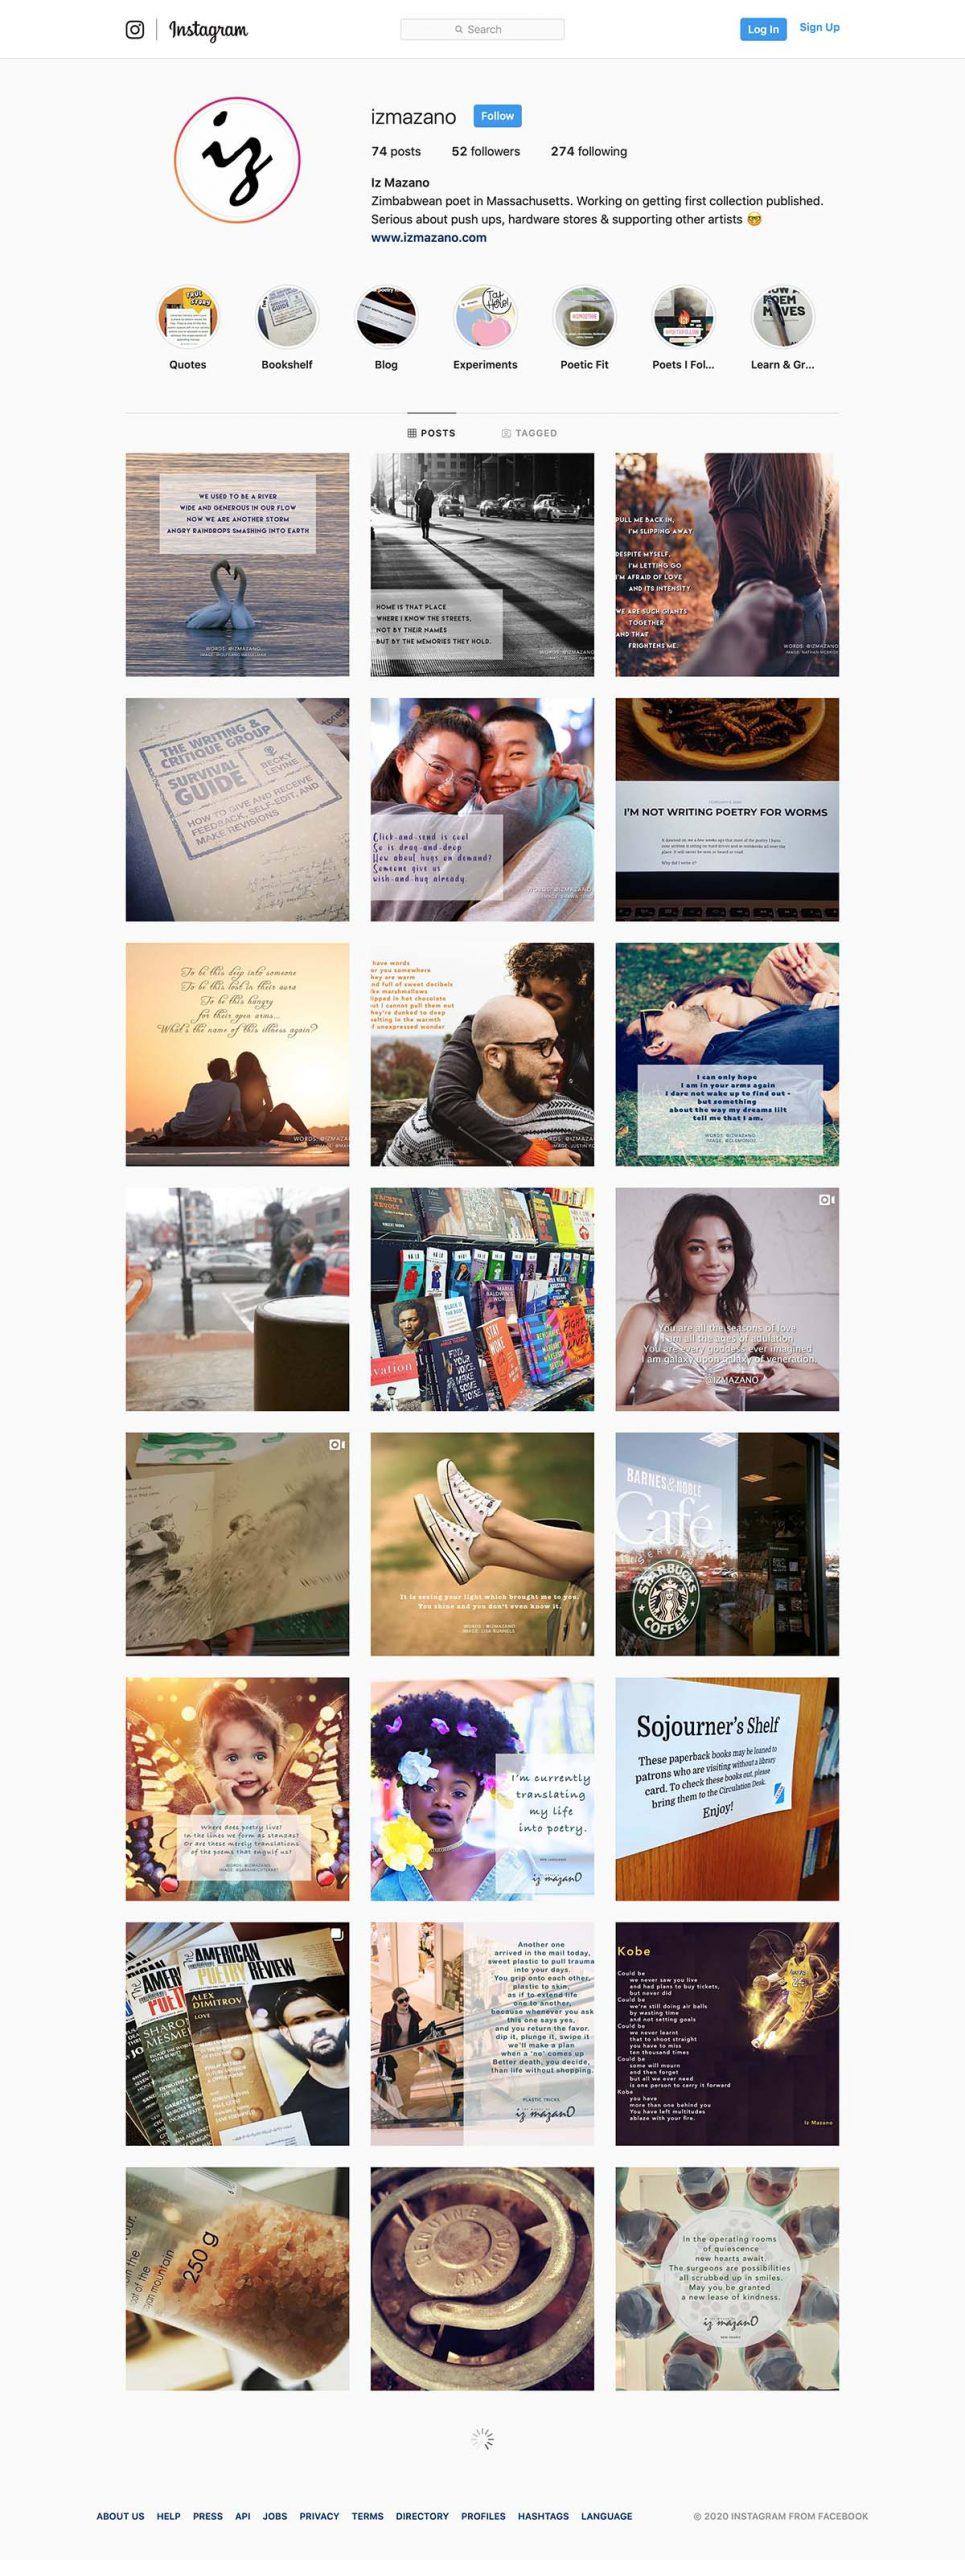 Iz Mazano Instagram screenshot - Feb 11, 2020